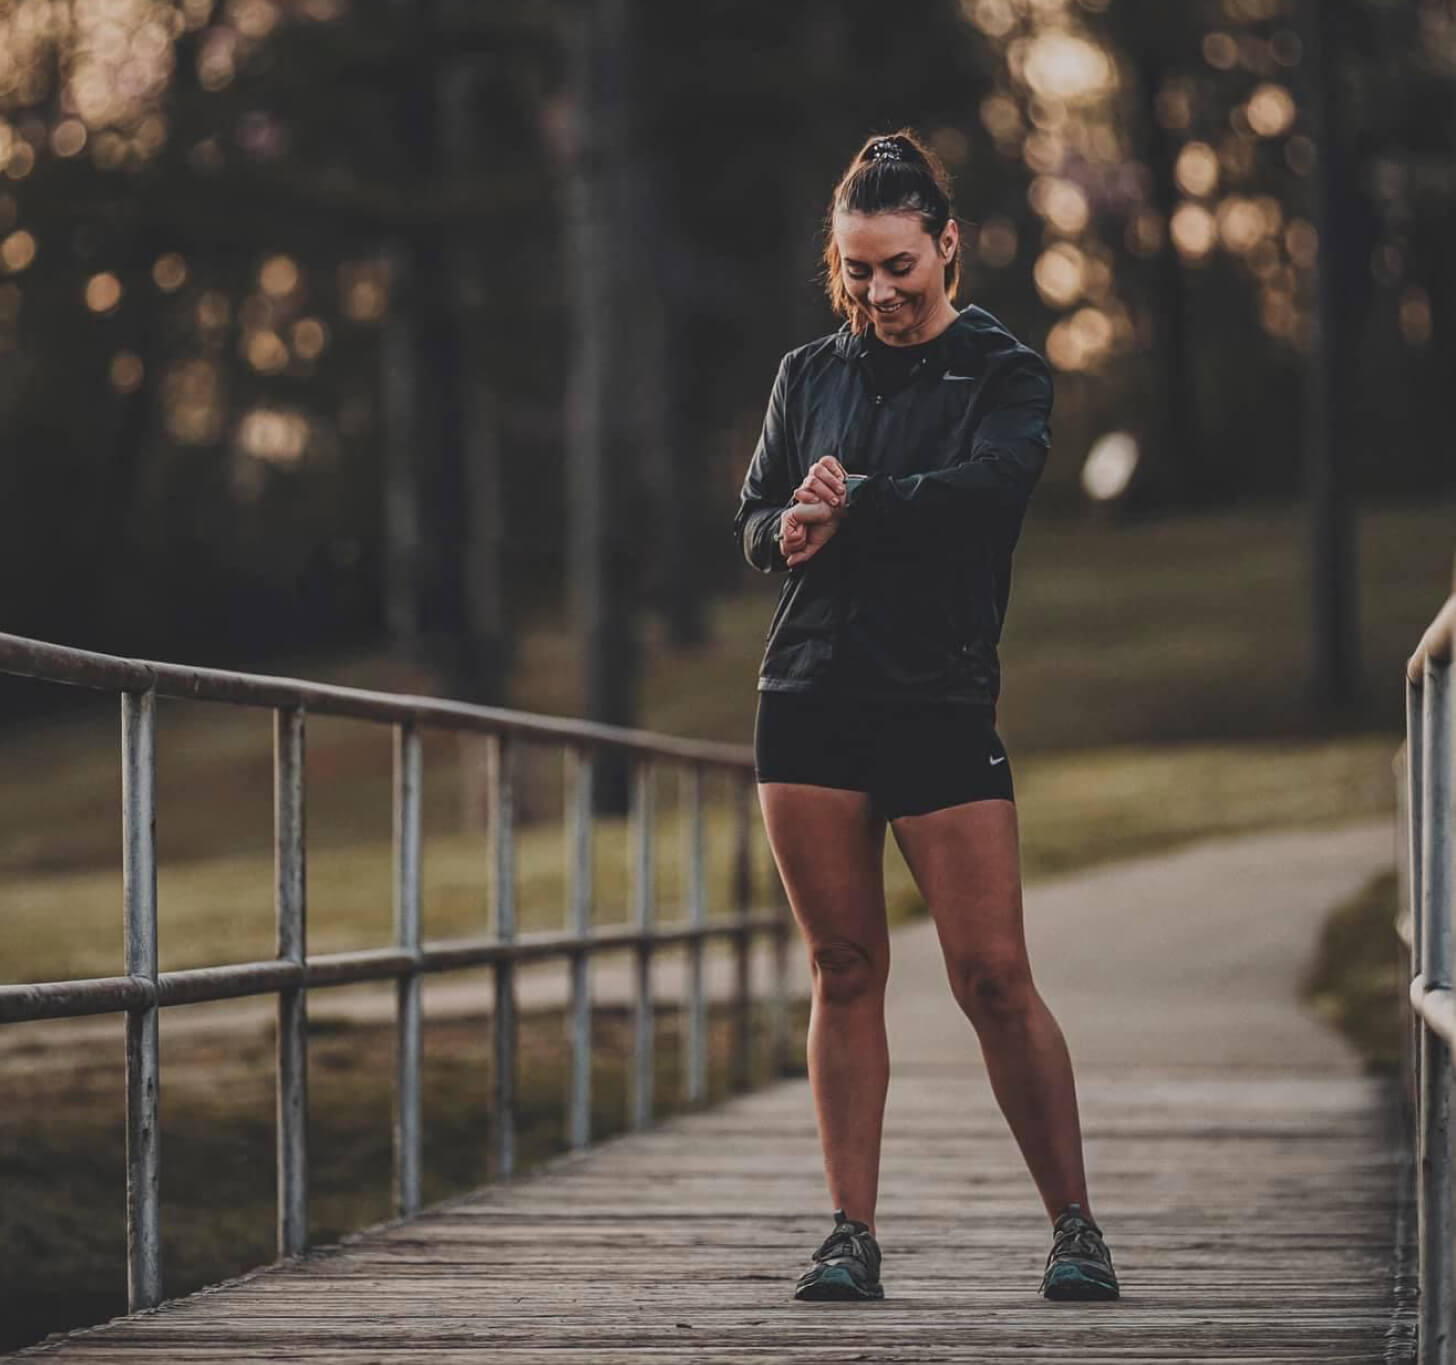 iFIT Member Breanna Maurer does a running workout